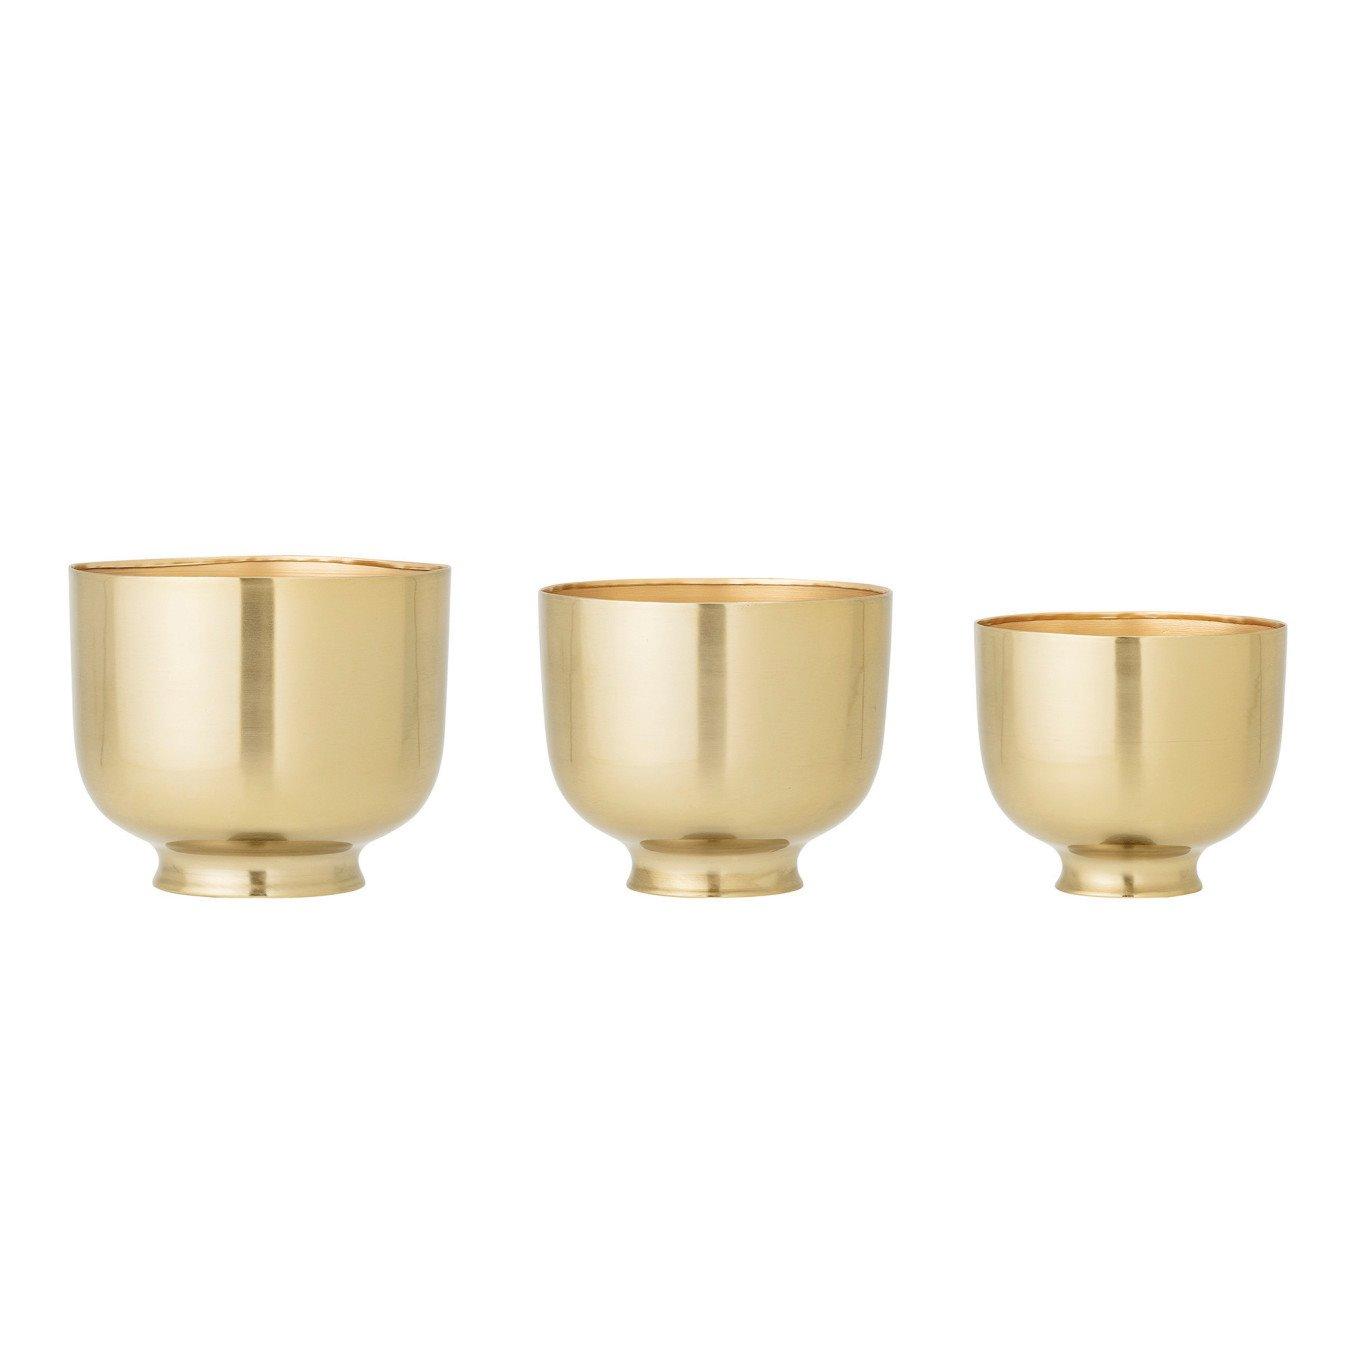 Gold Metal Planters, Set of 3